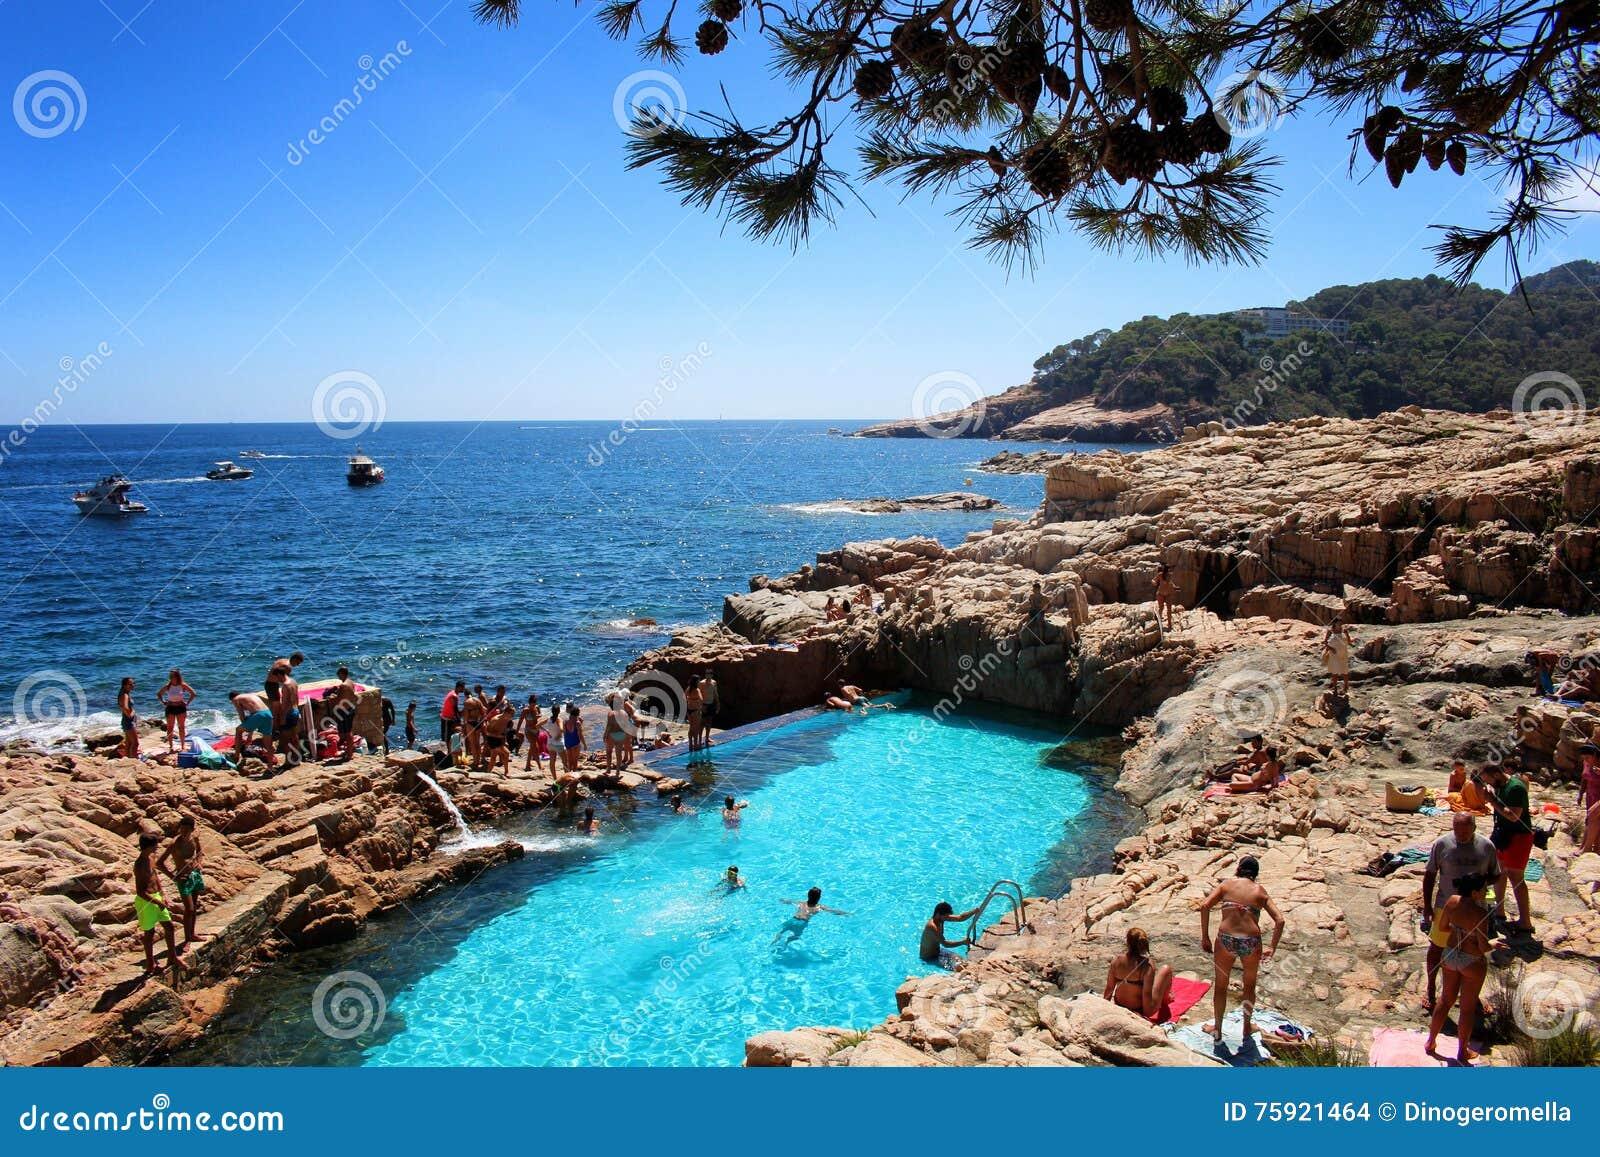 piscina natural en costa brava imagen de archivo editorial